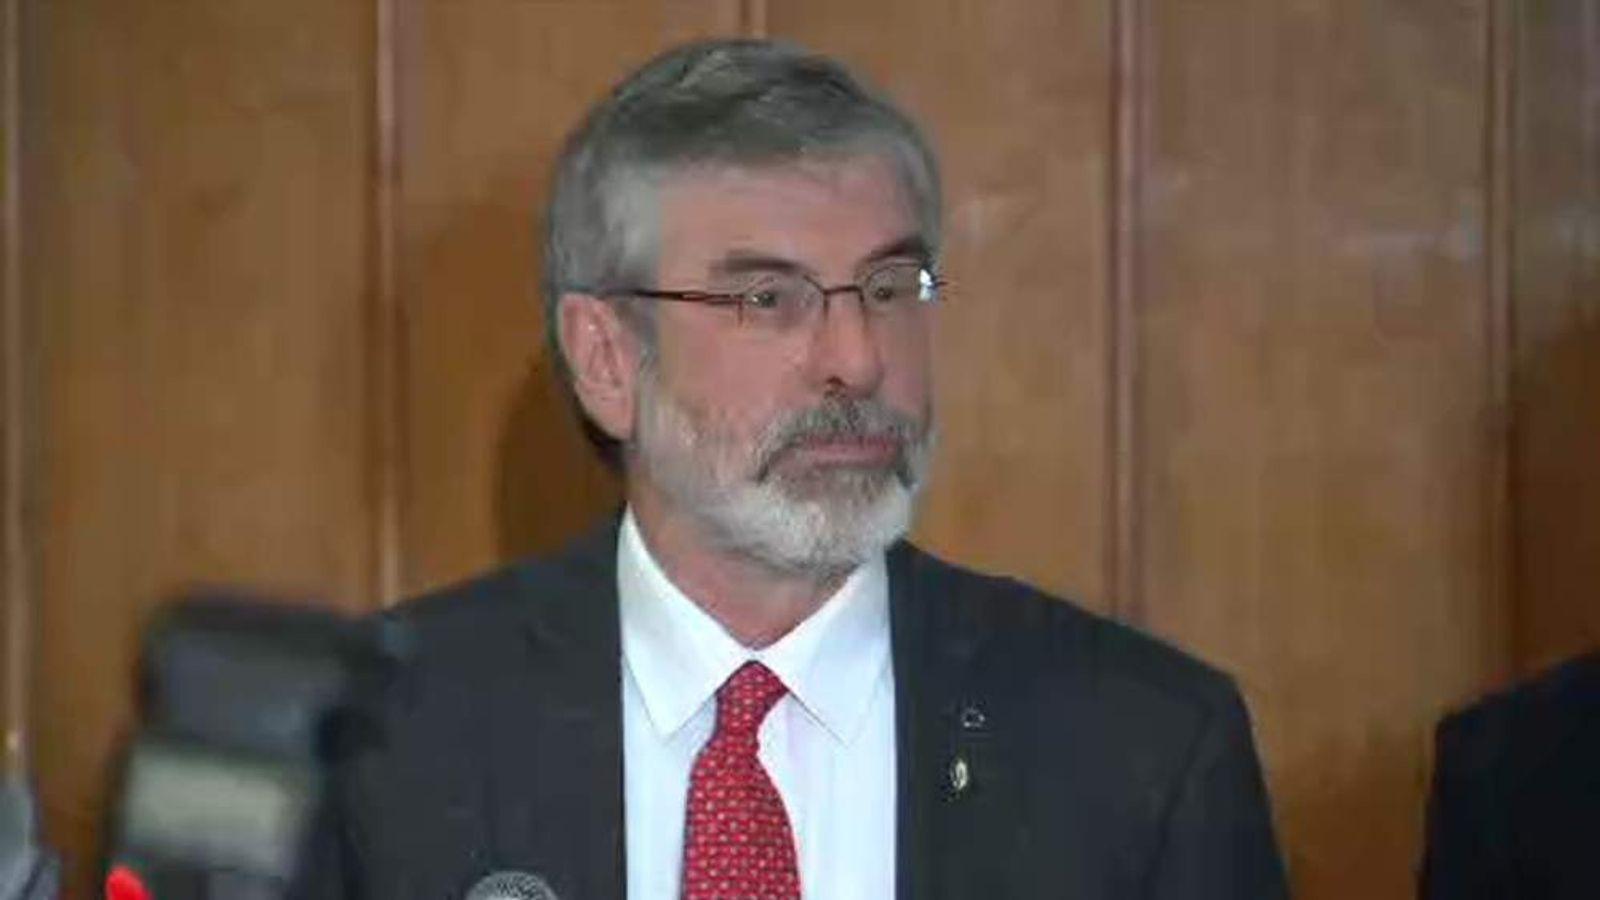 Sinn Fein President Gerry Adams released from custody